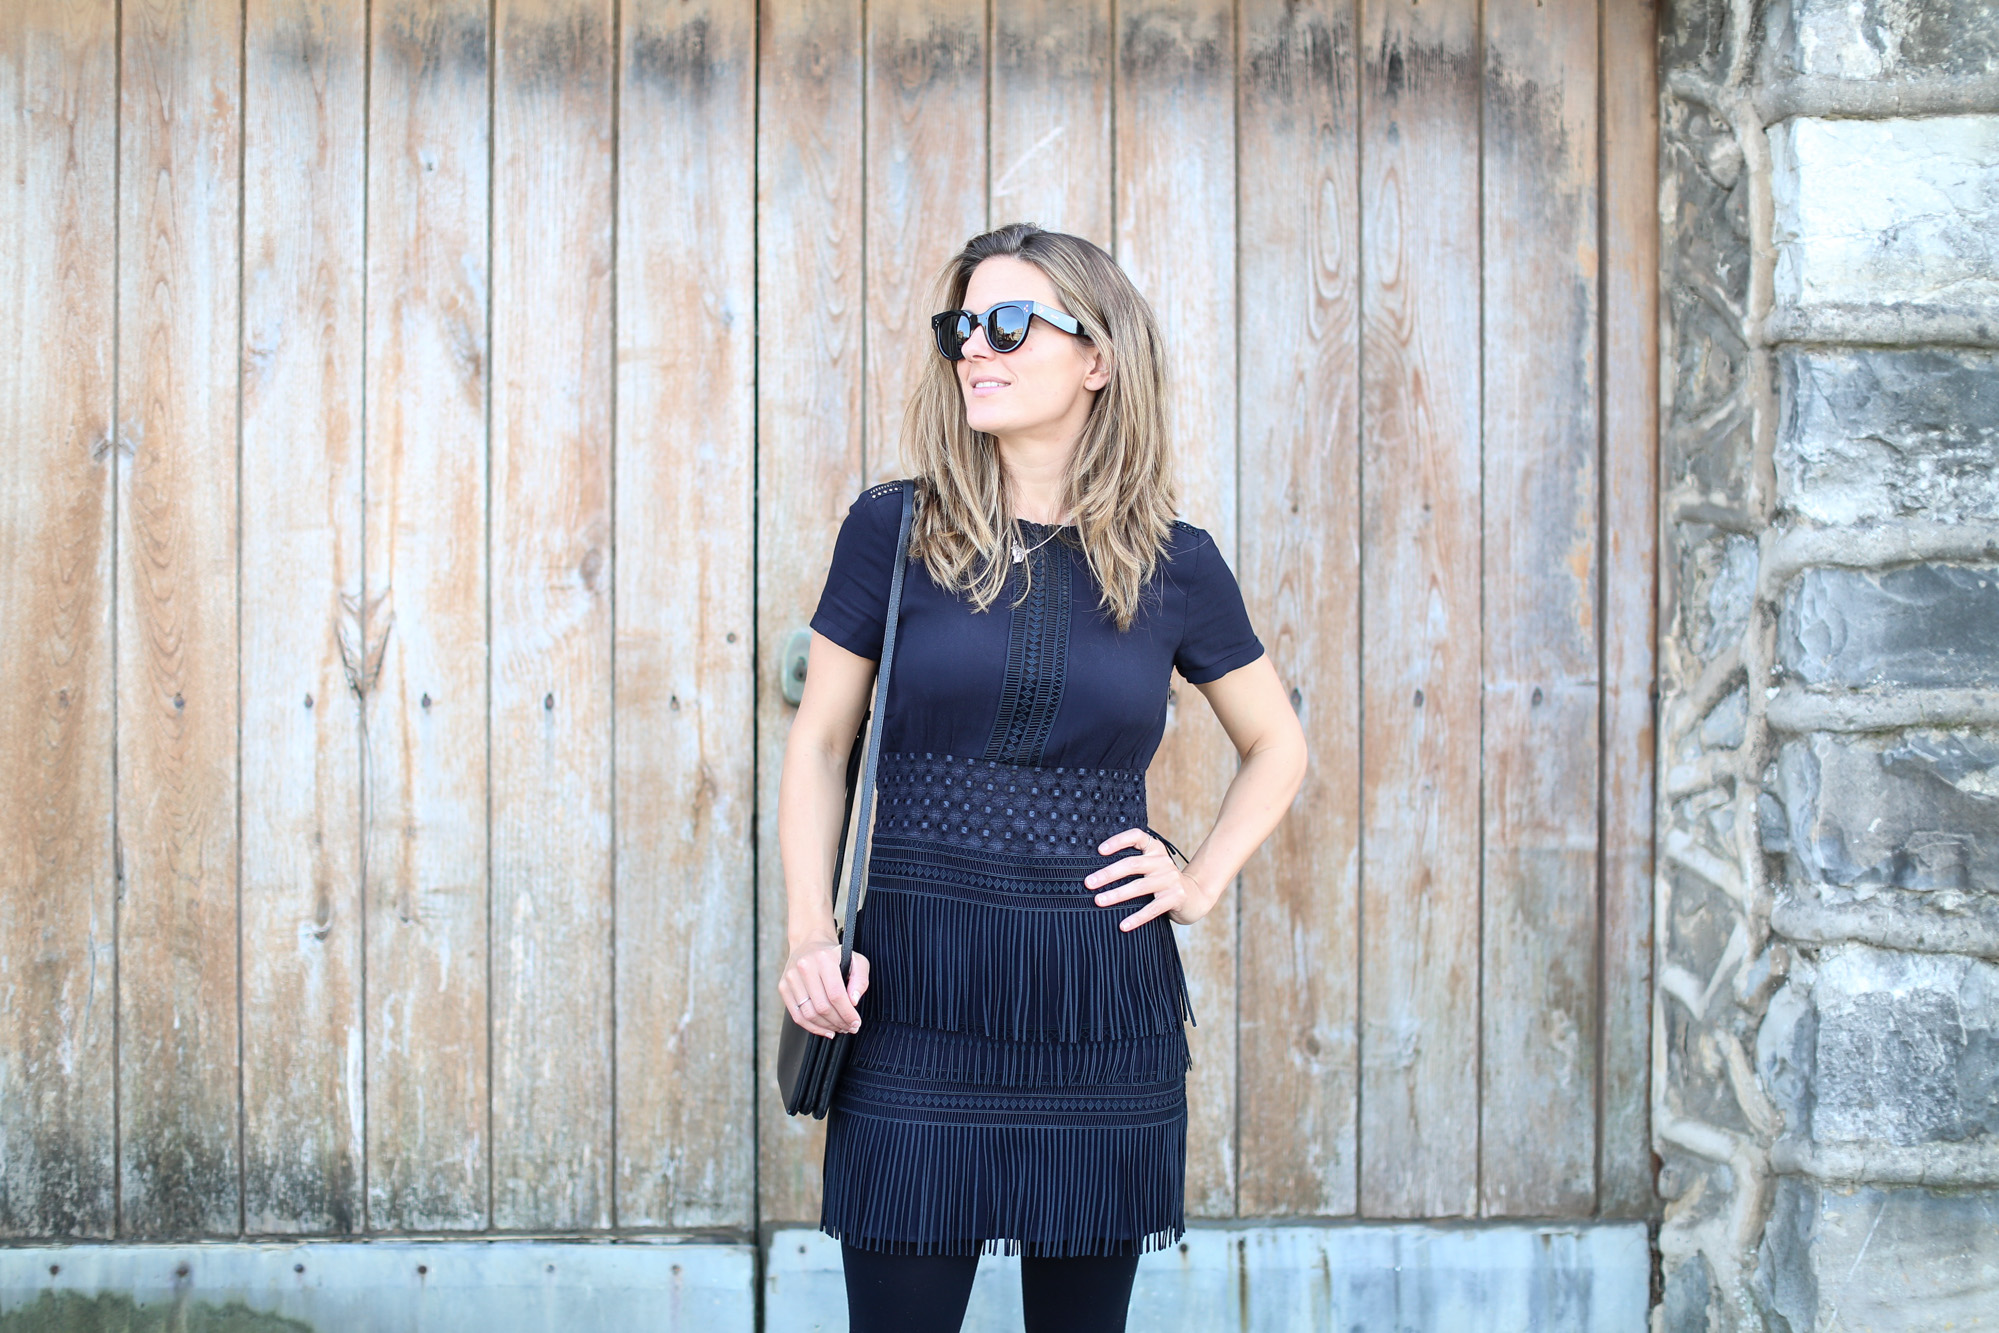 Clochet_streetstyle_fashionblogger_zapatosplanosbroguestachuelasPertini_vestidoMajeflecosReia-4